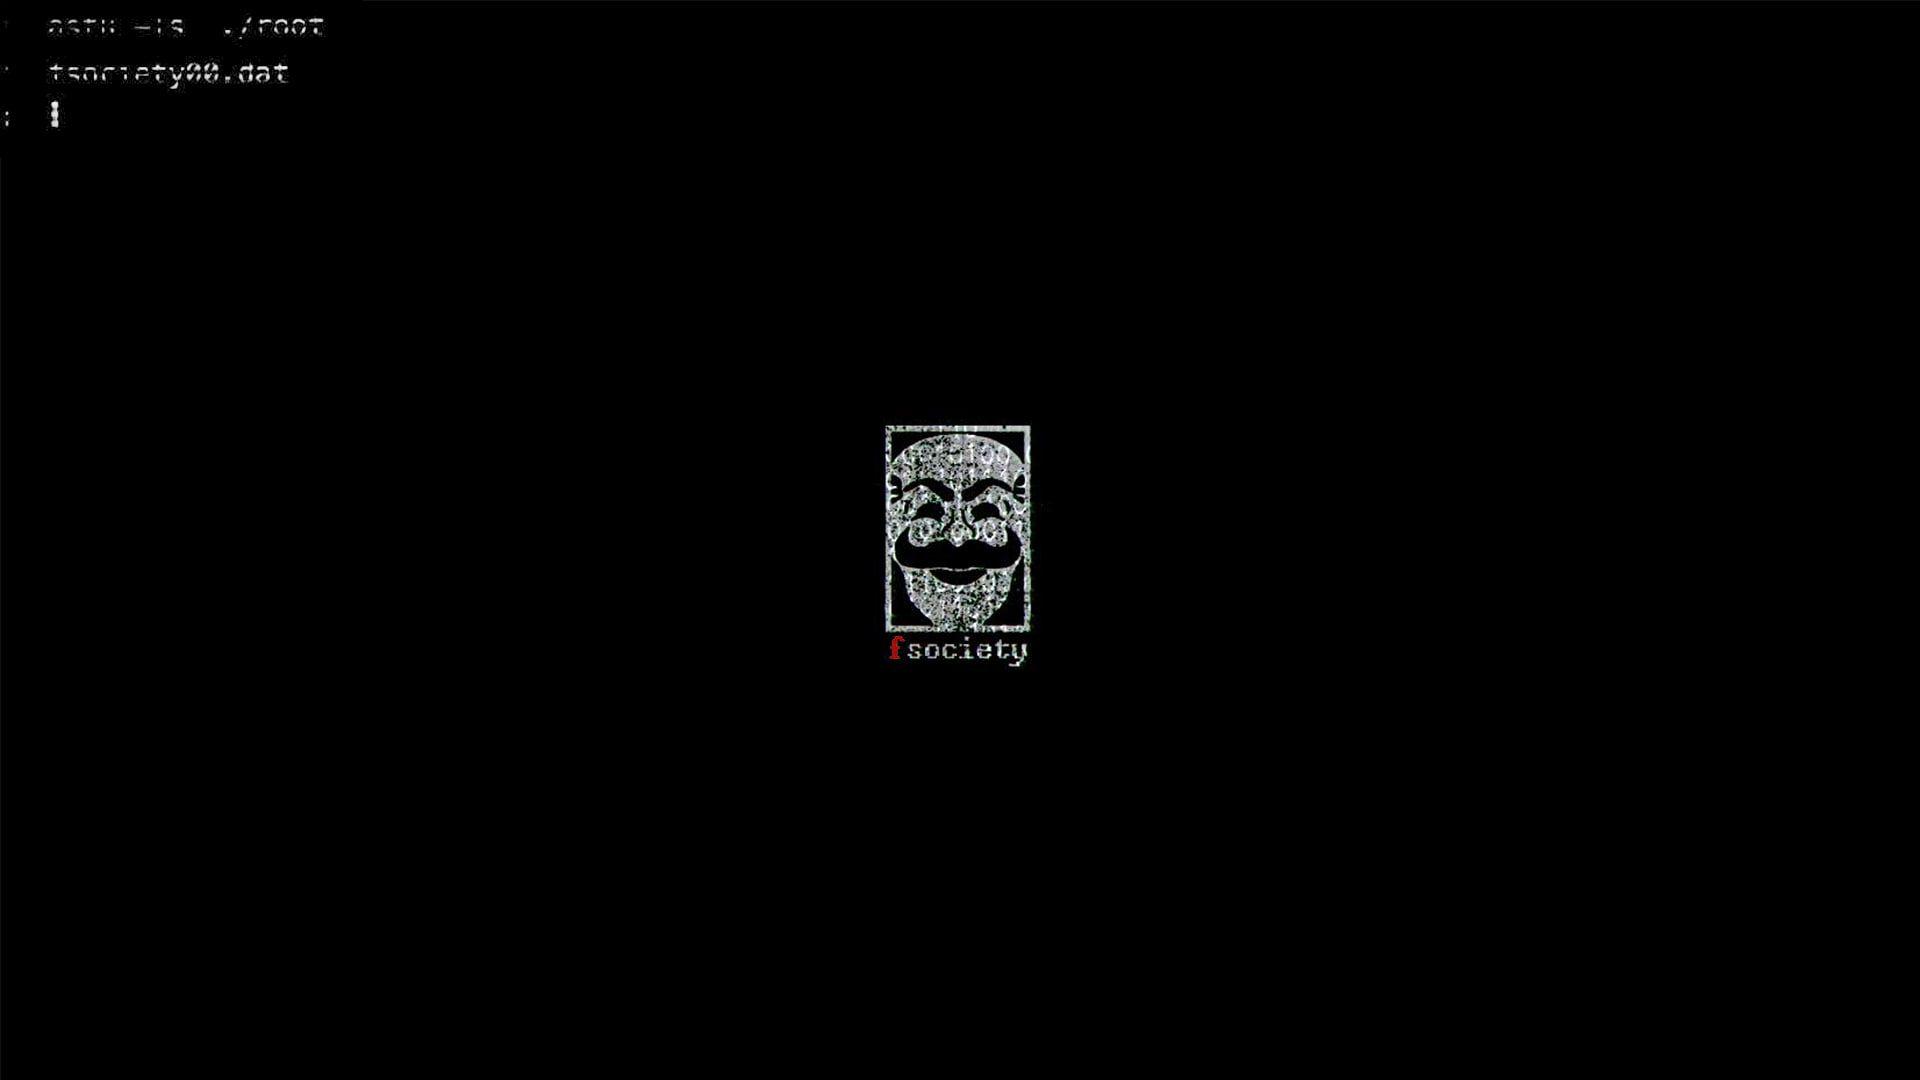 Hacking Fsociety Mr Robot 1080p Wallpaper Hdwallpaper Desktop Chernyj Fon Oboi Fony Oboi